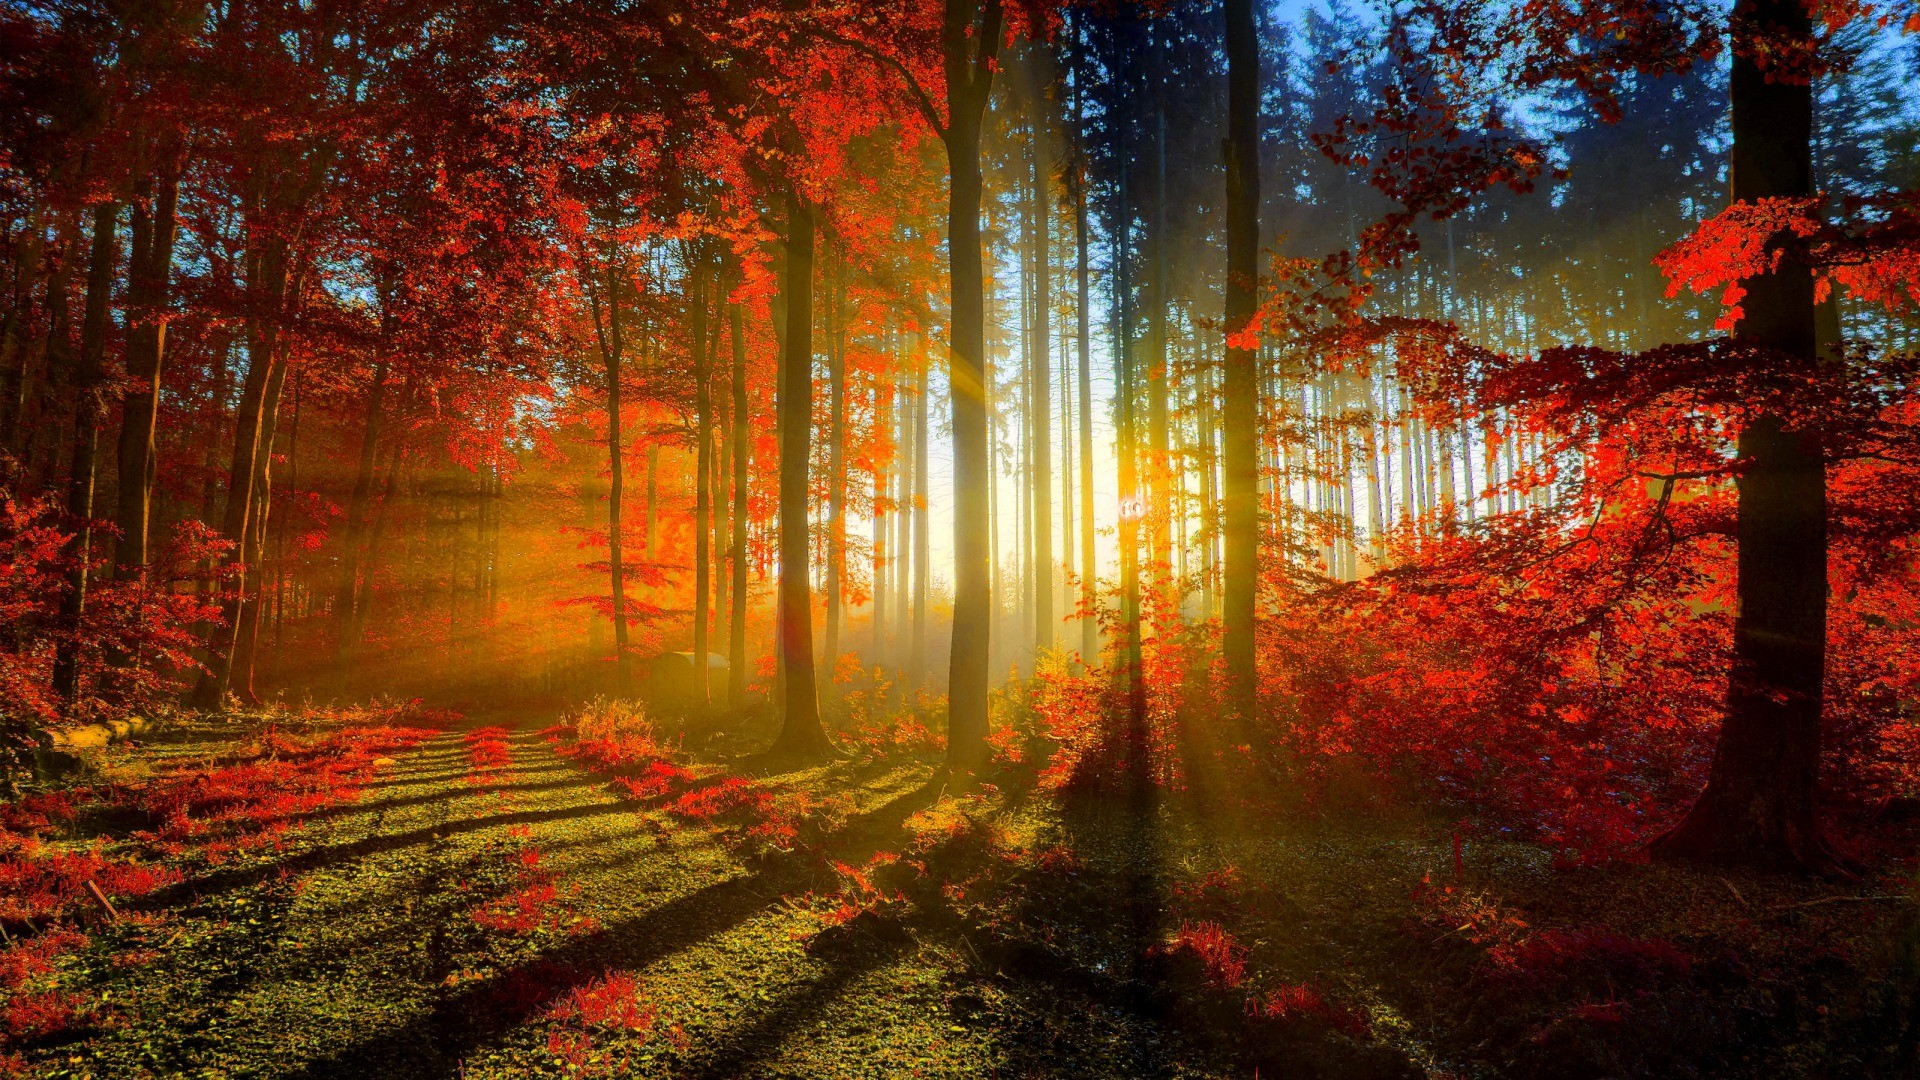 autumn wallpaper widescreen download free amazing high